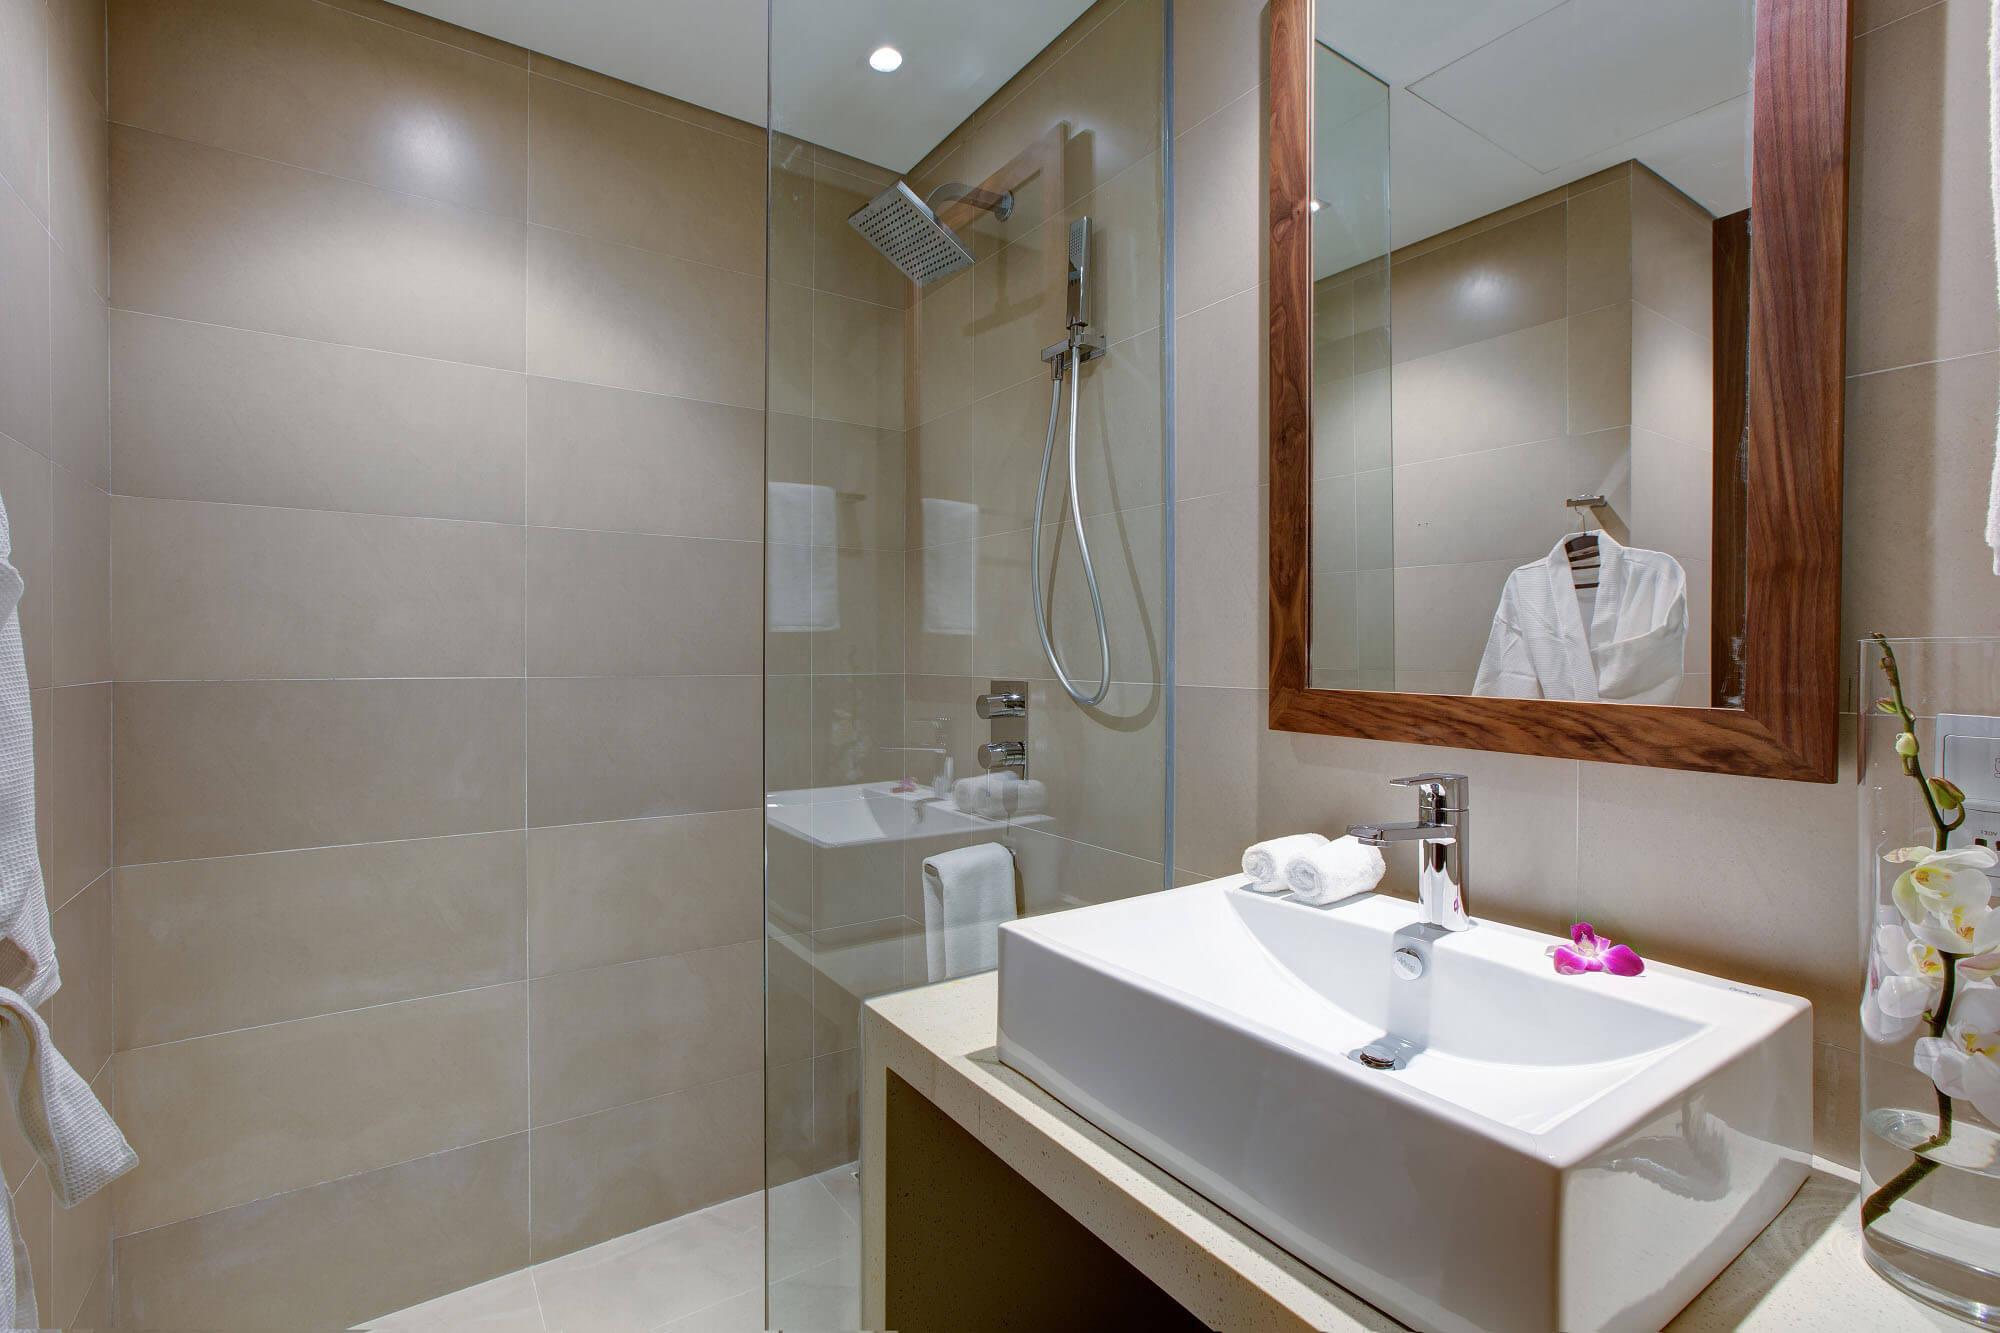 Delight Plus Apartment Apartment A La Carte Danang Beach Hotel 200 Vo Nguyen Giap Danang Fantasticity Com 03